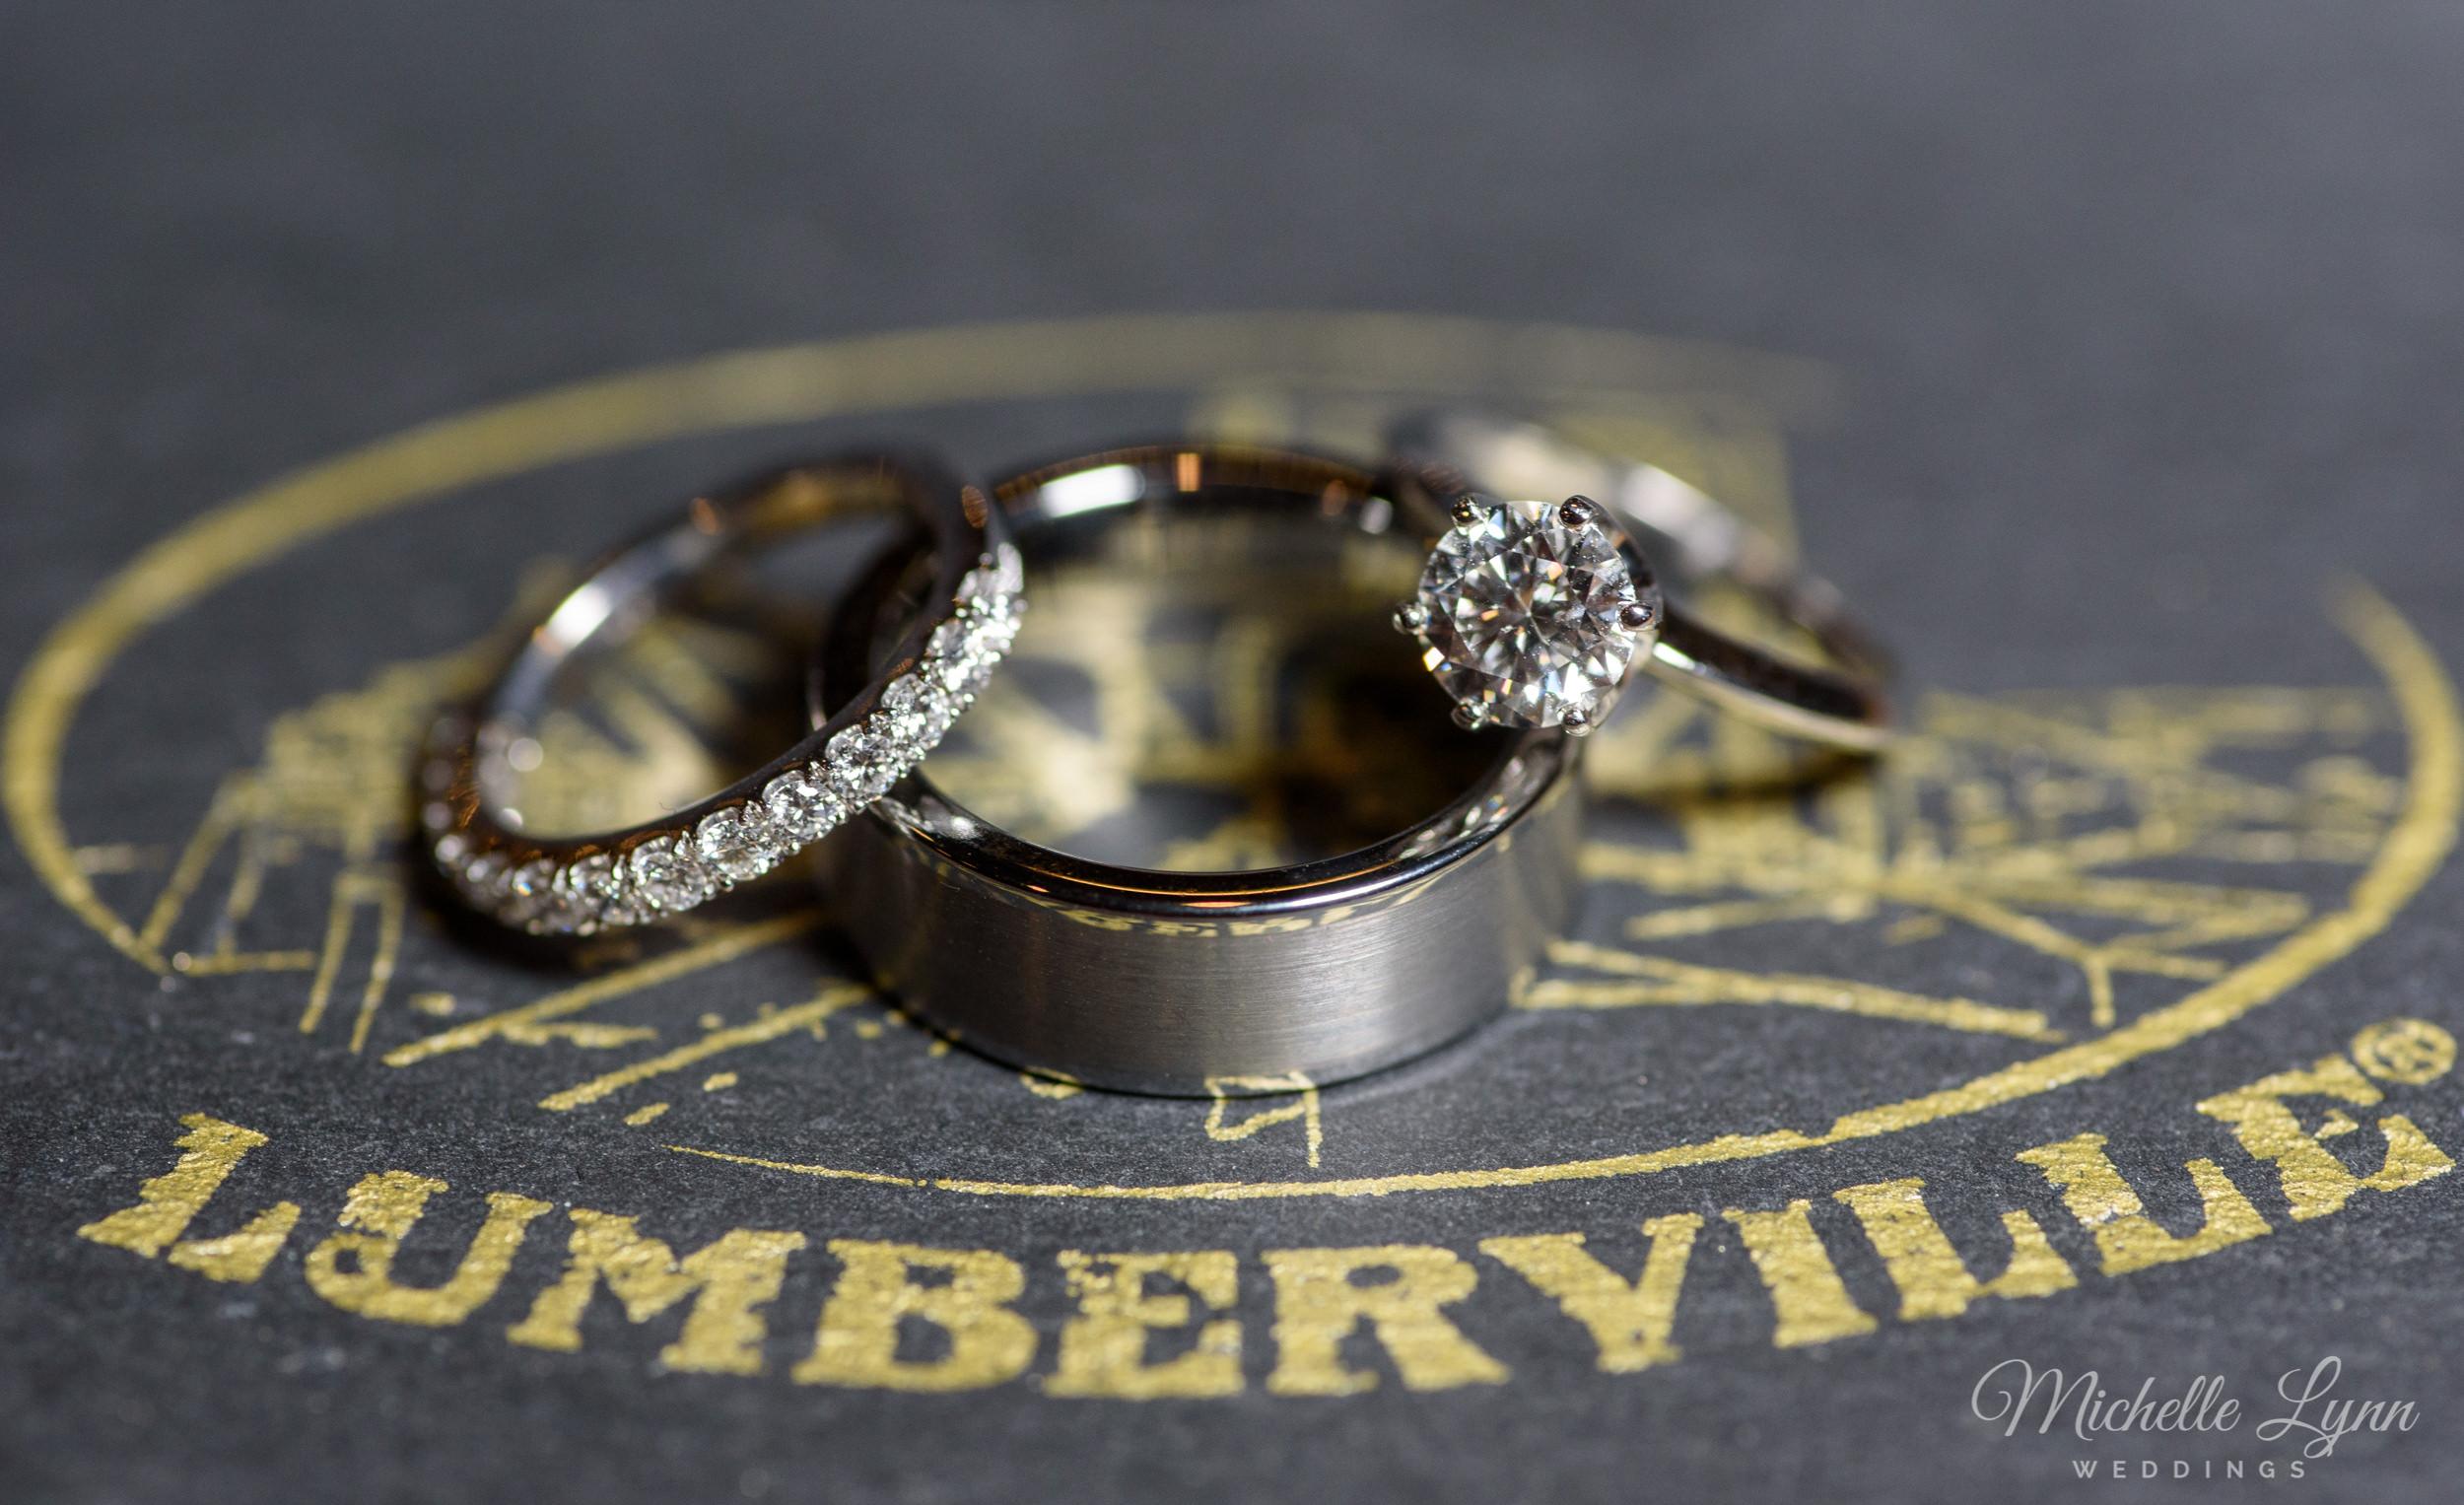 mlw-lumberville-general-store-new-hope-wedding-photographer-52.jpg